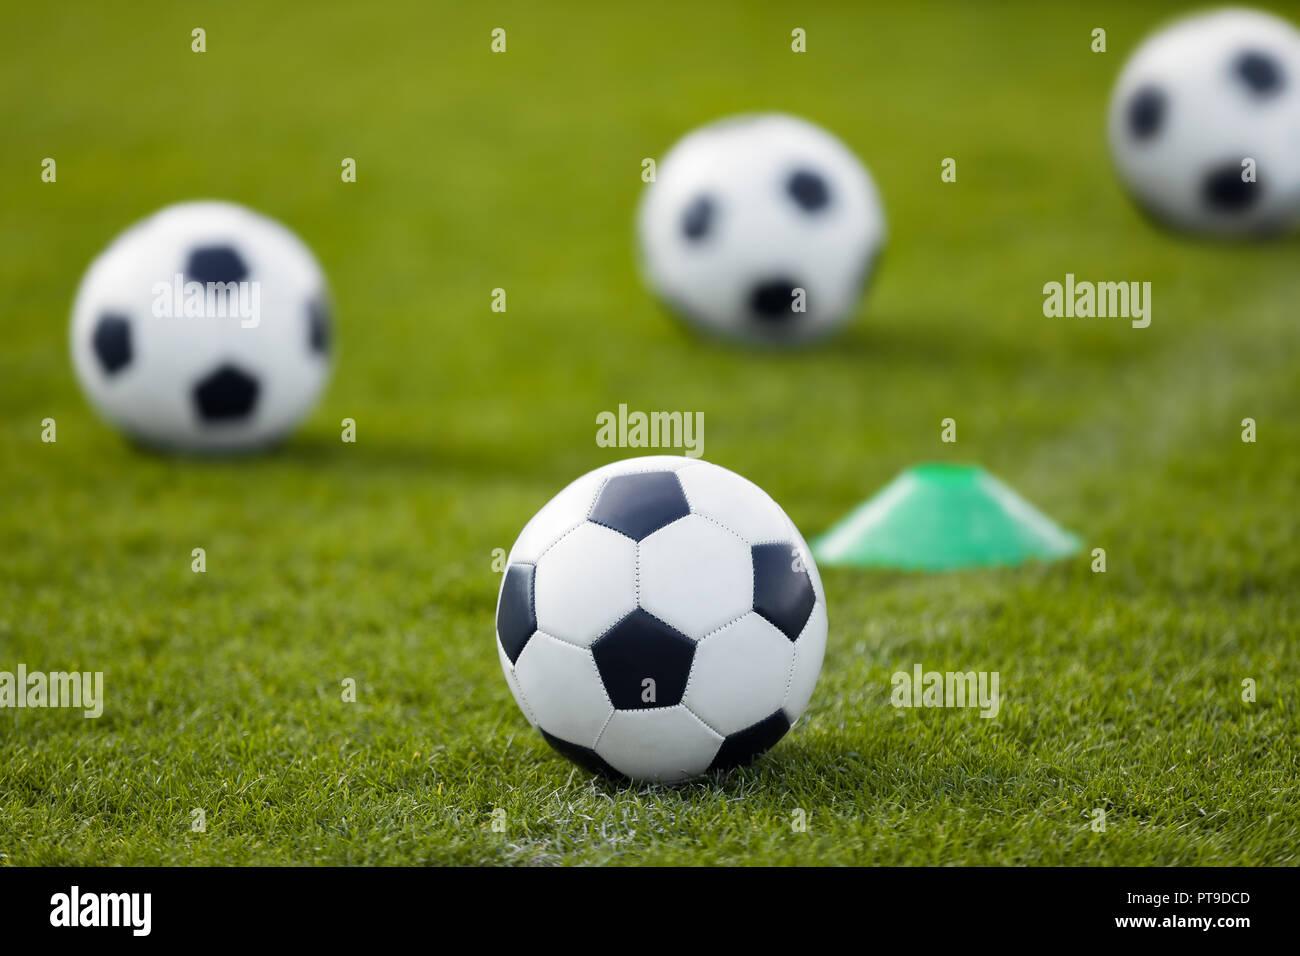 Sport Football Background. Soccer Balla on Grass Field at Stadium. Football poster. - Stock Image